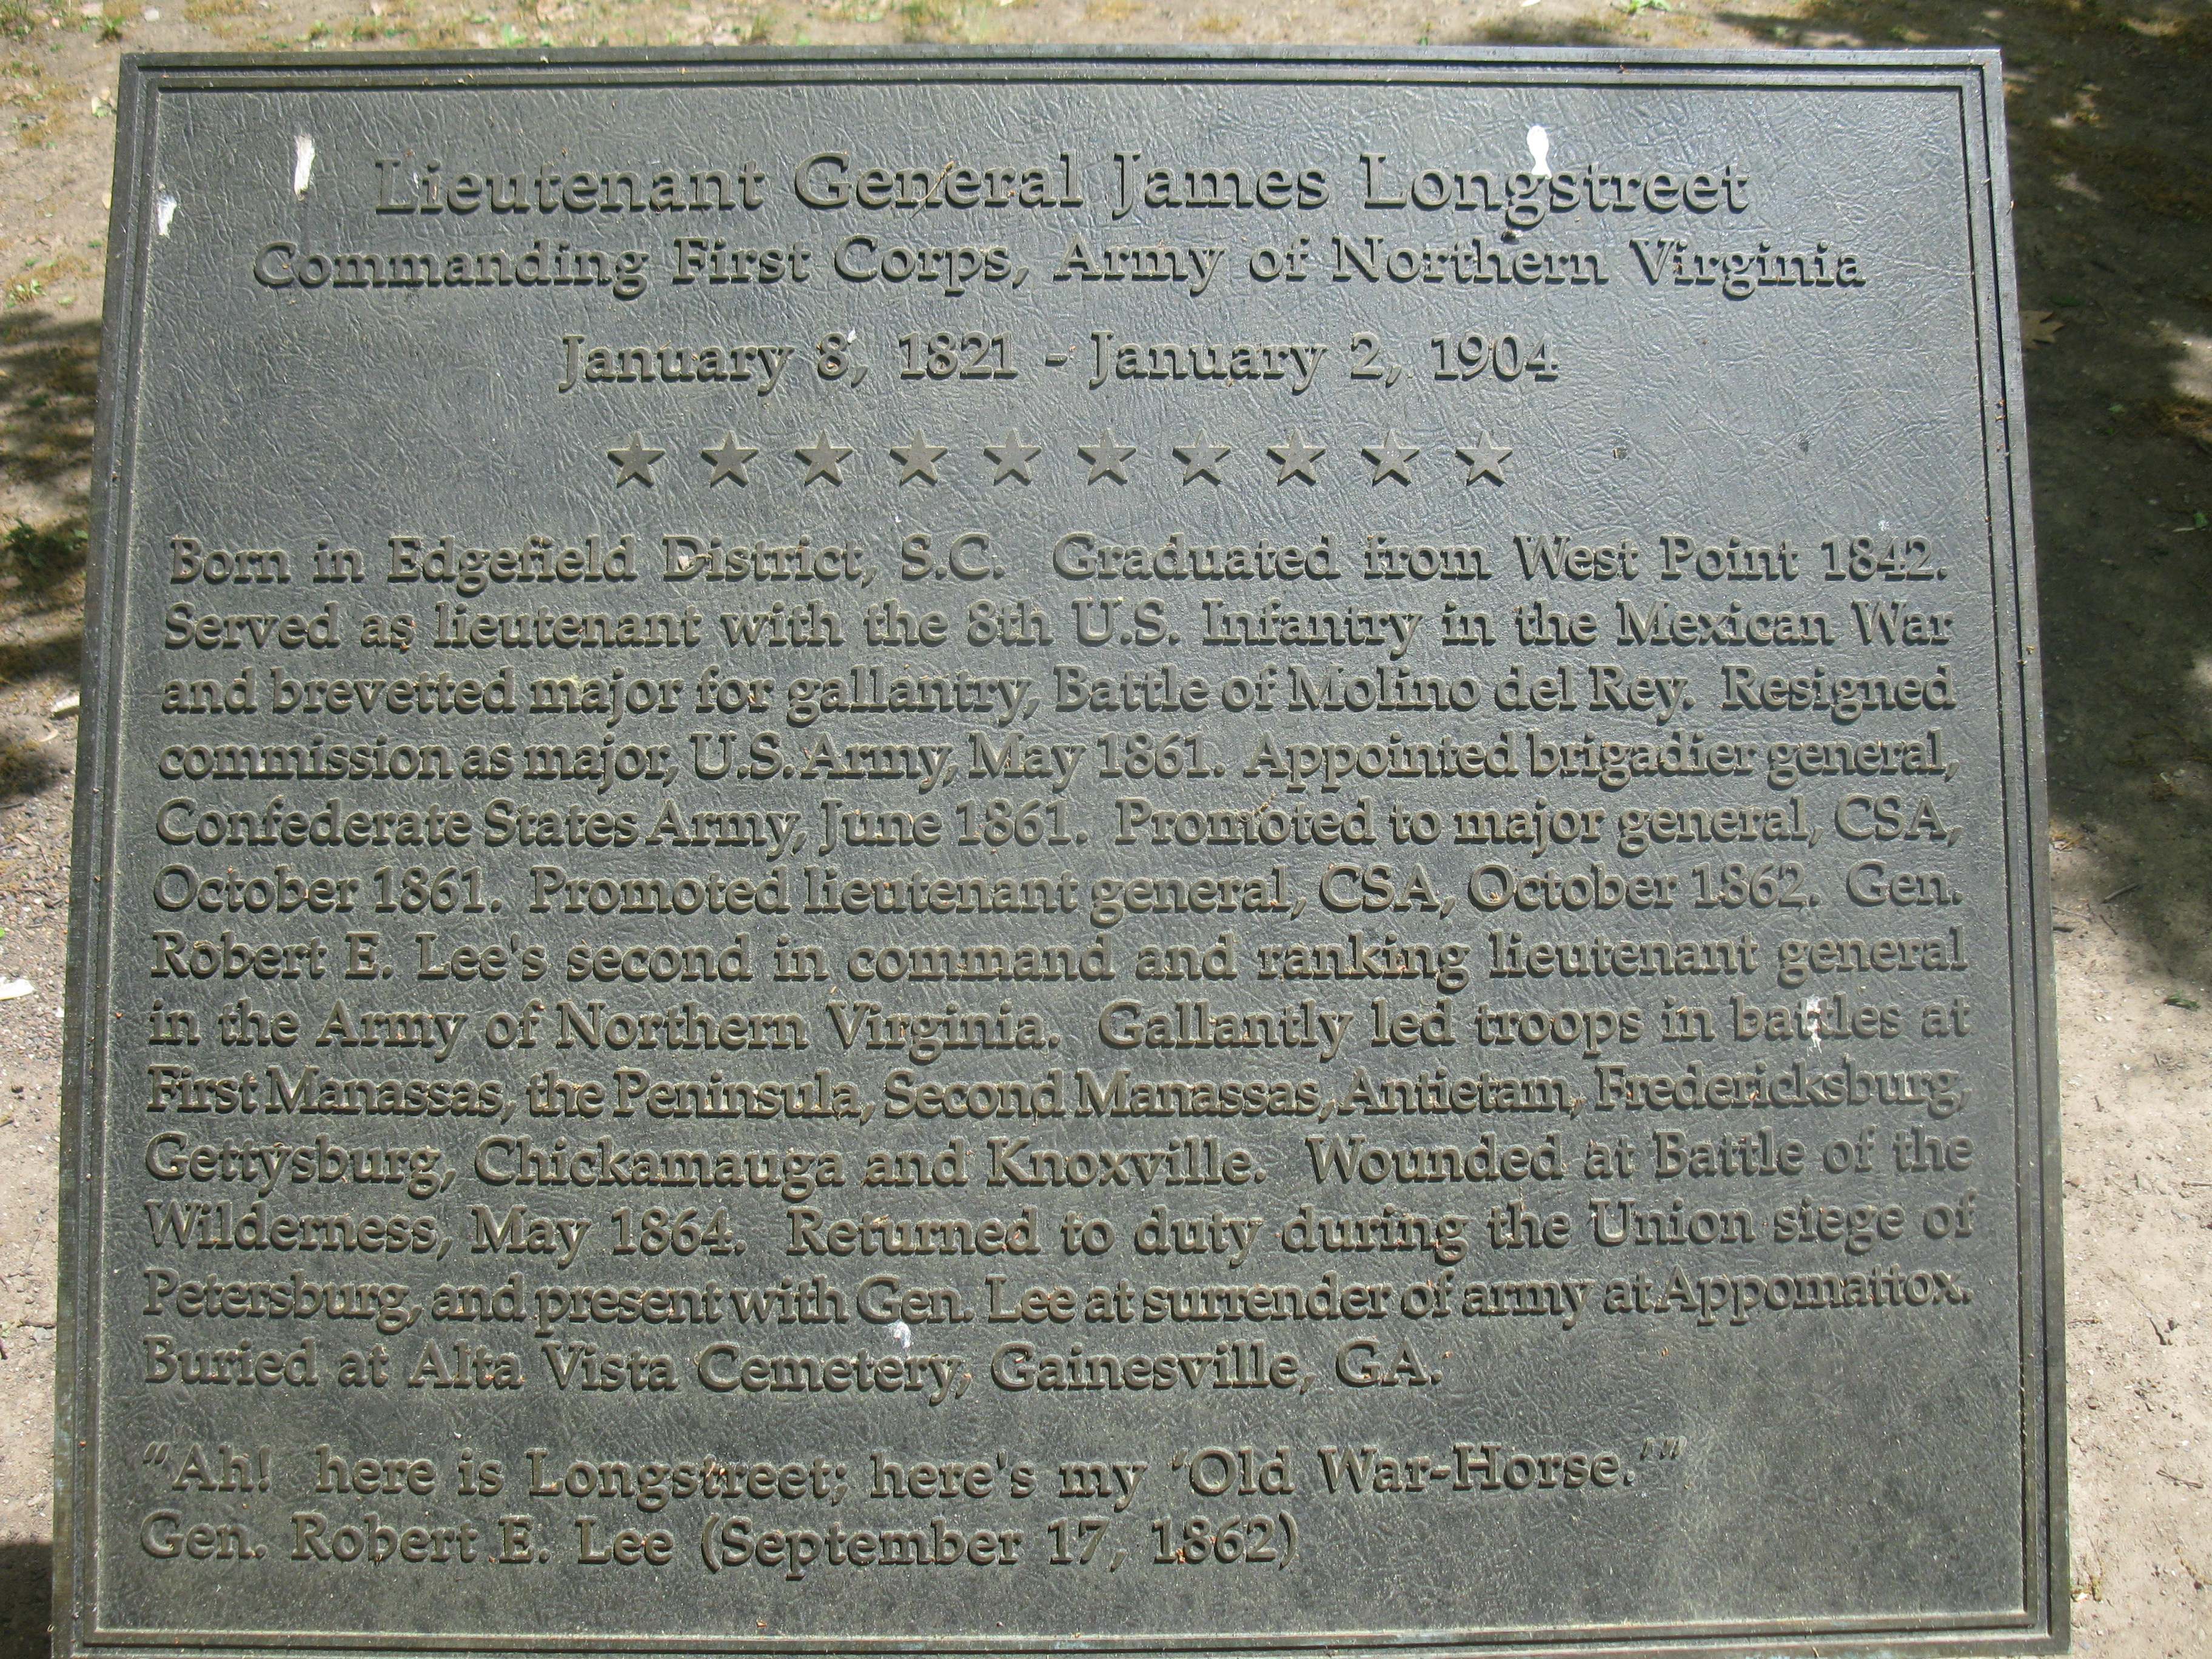 Plaque at General James Longstreet Memorial